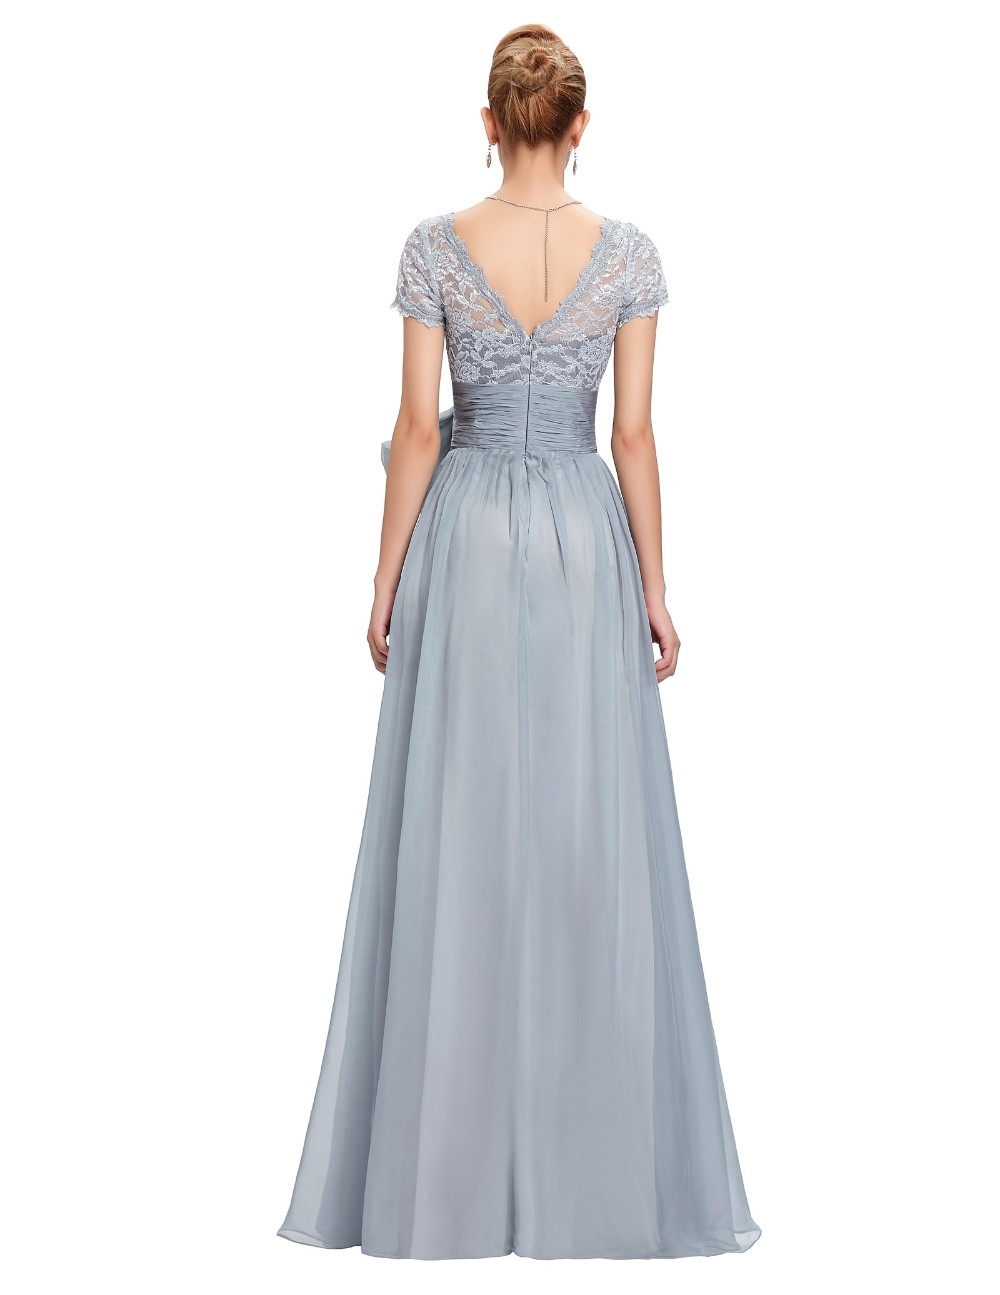 Grace Karin Chiffon Lace Elegant Long Evening Dresses Grey Formal Evening Gowns robe de soiree longue GK4445 10